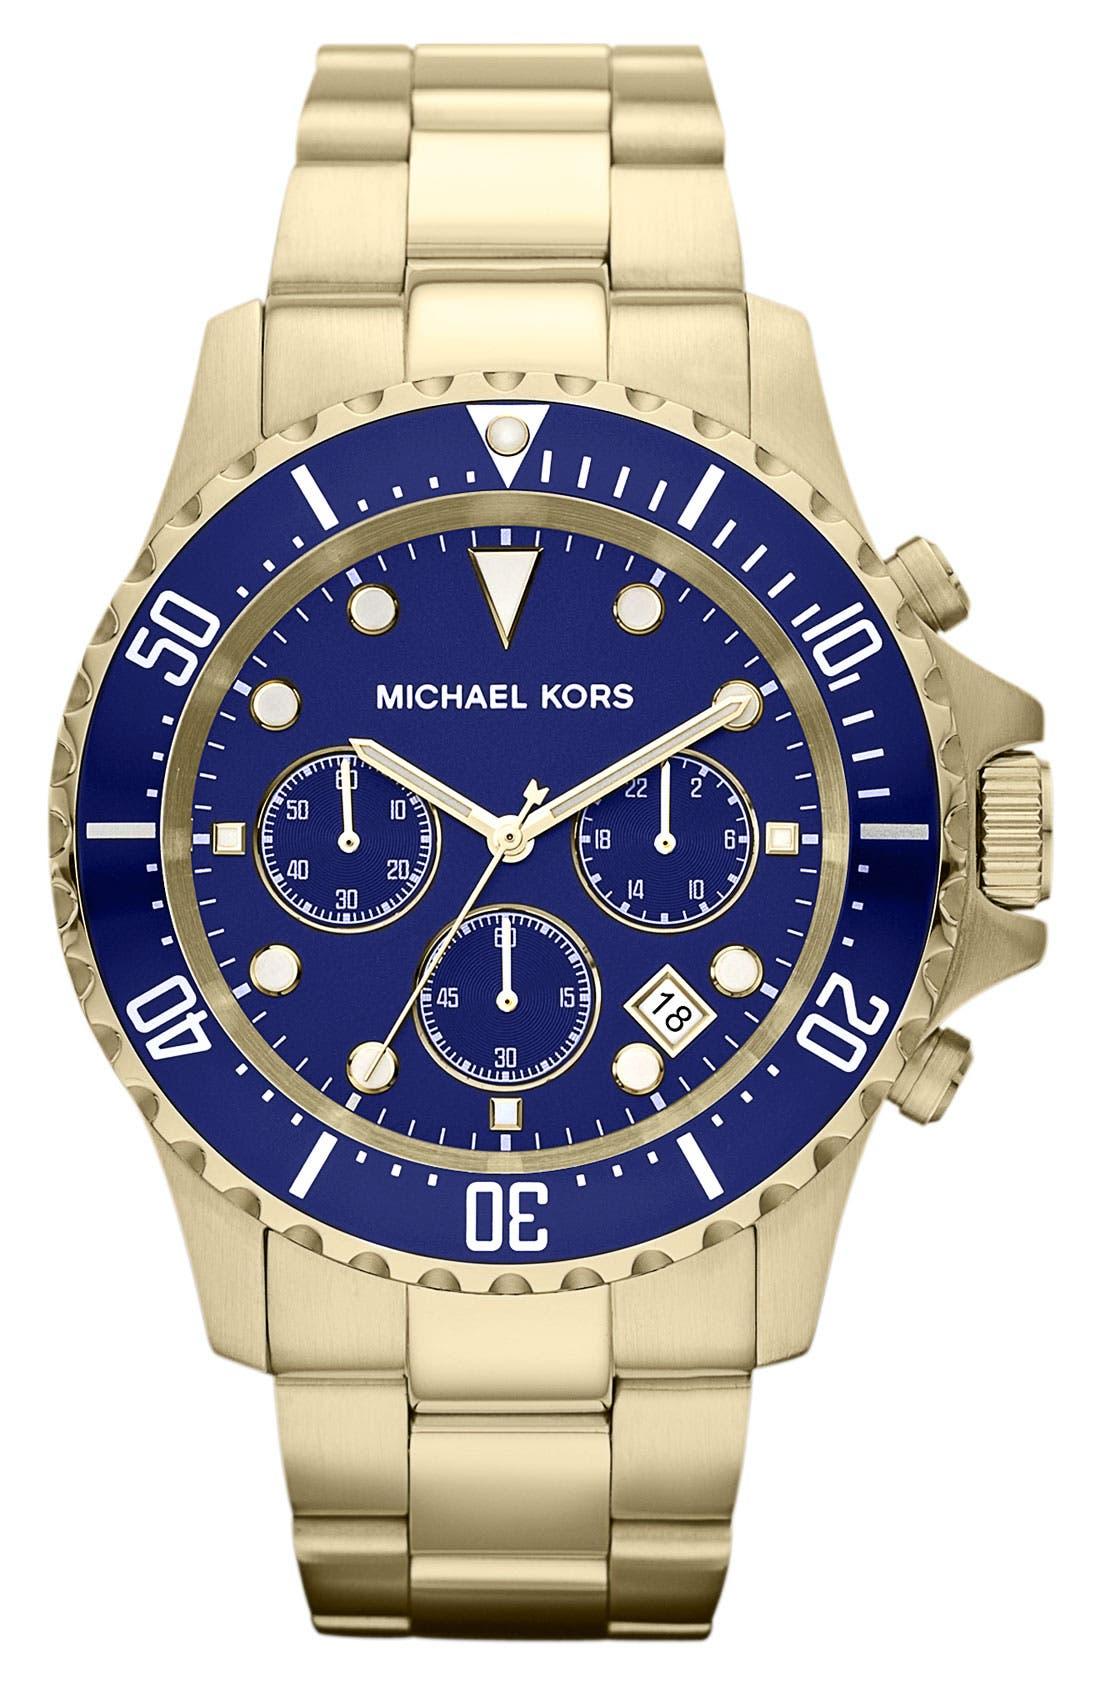 Main Image - Michael Kors 'Everest' Chronograph Bracelet Watch, 45mm